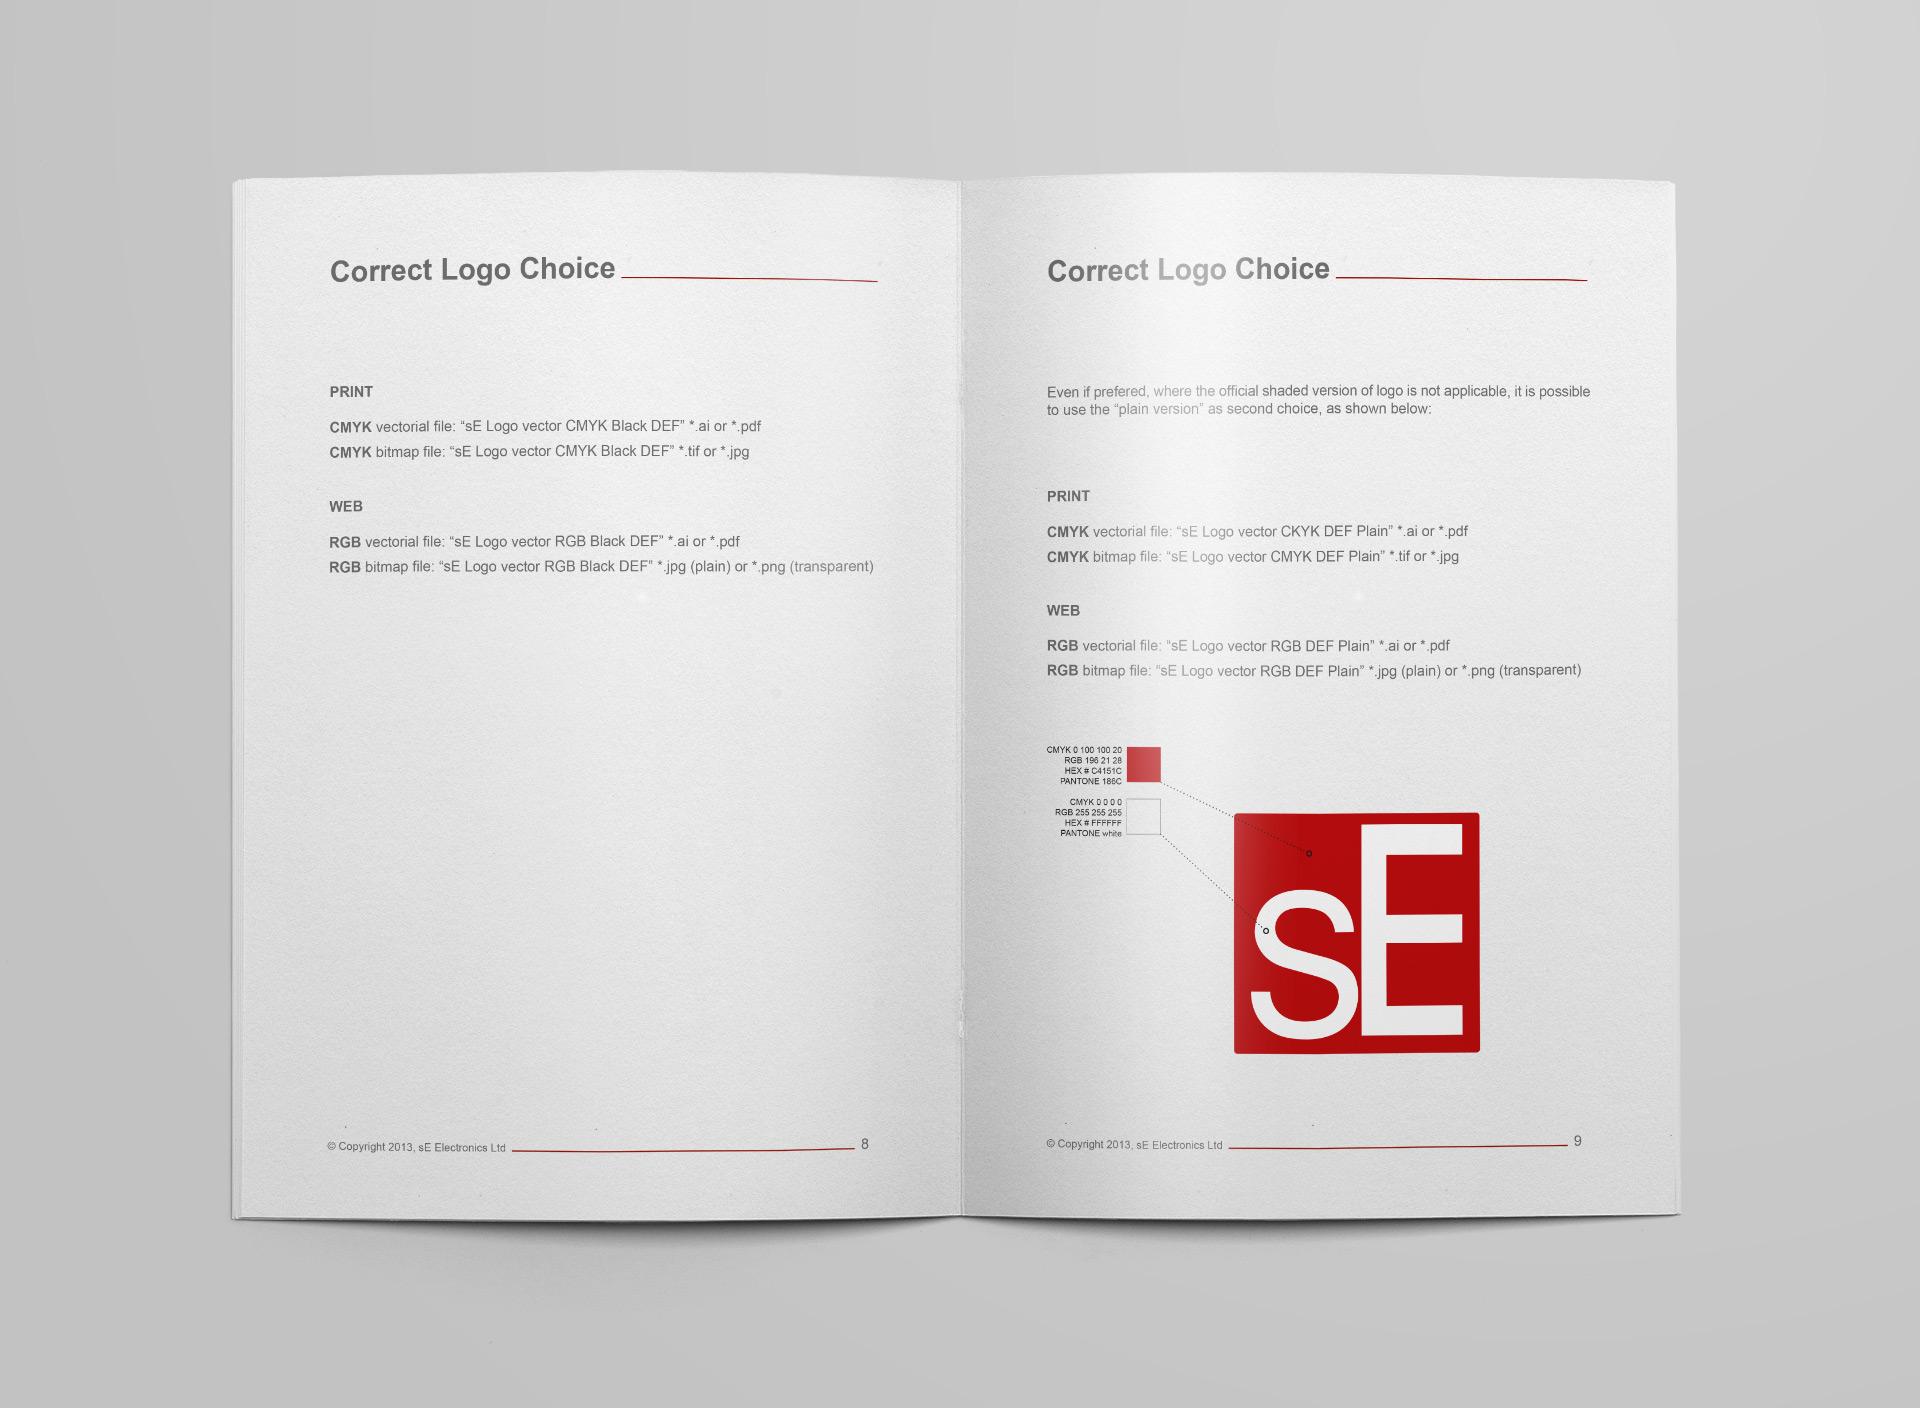 sE-guidelines-08-09